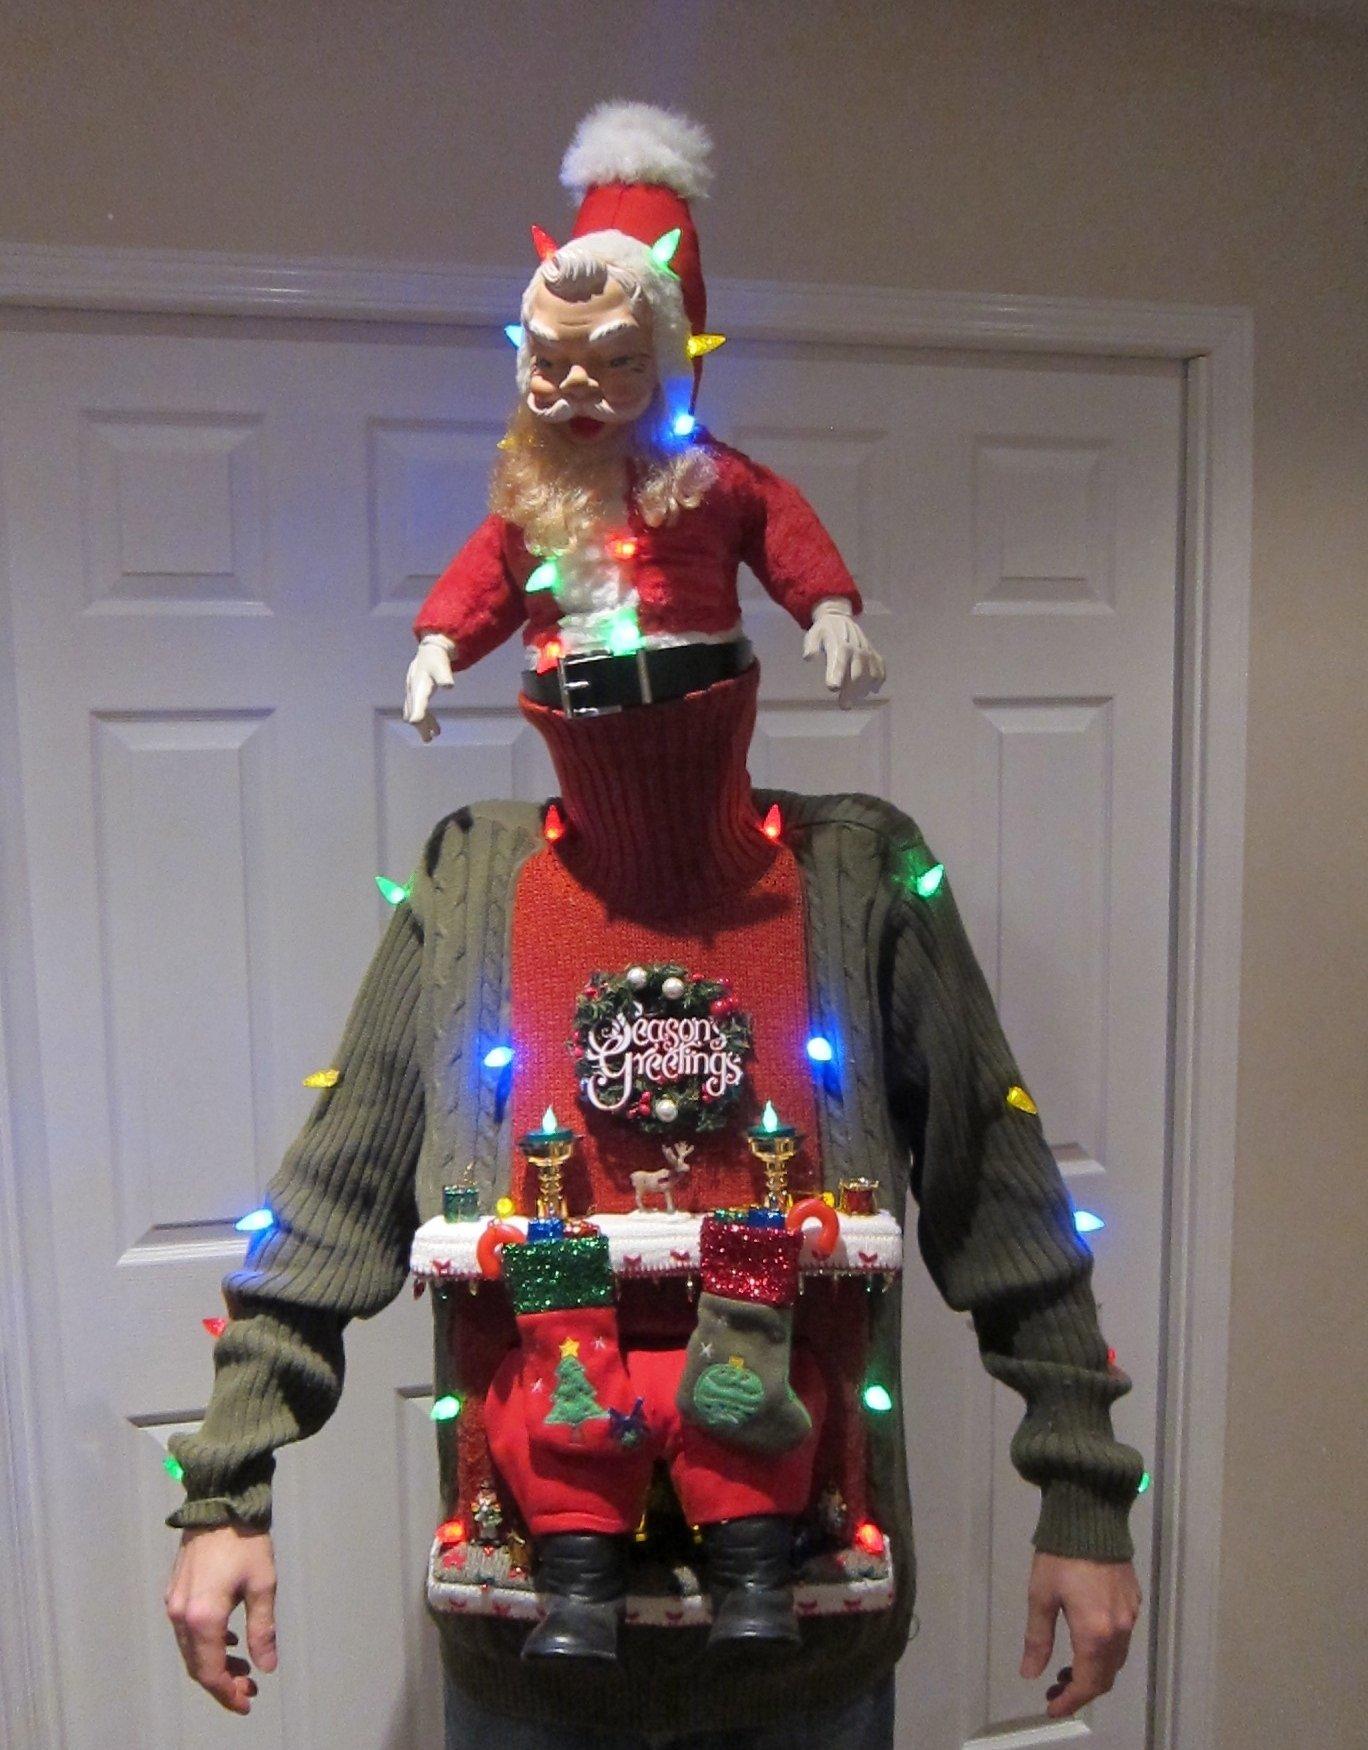 10 Stunning Ugly Christmas Sweater Ideas Homemade 53 diy ugly christmas sweater ideas 4